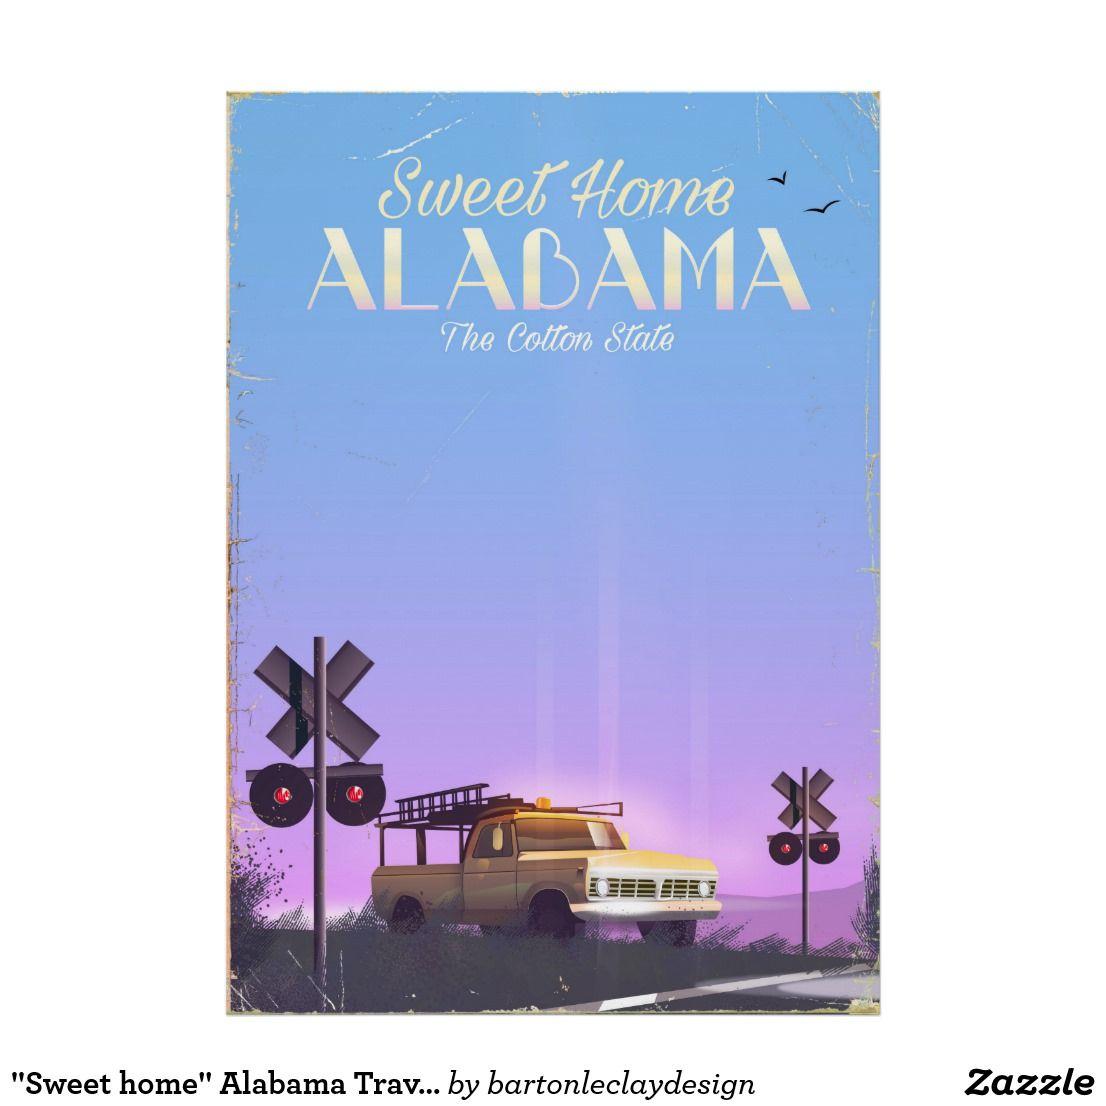 Sweet Home Alabama Travel Poster Zazzle Com Alabama Travel Travel Posters Retro Travel Poster